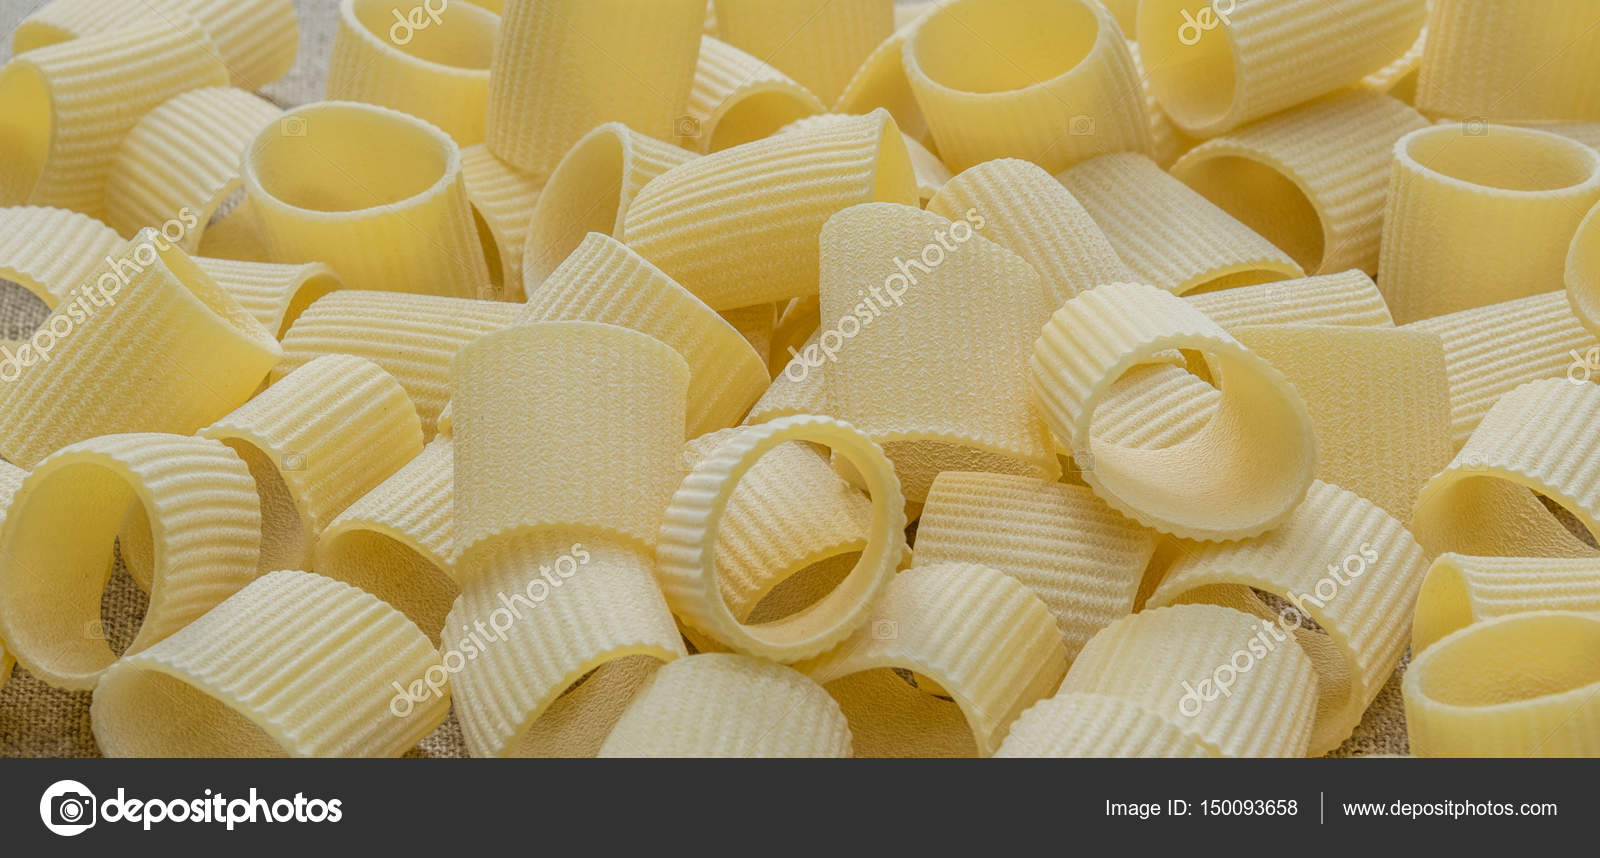 Uberlegen Moderne Italienische Küche. Nudeln U2014 Stockfoto